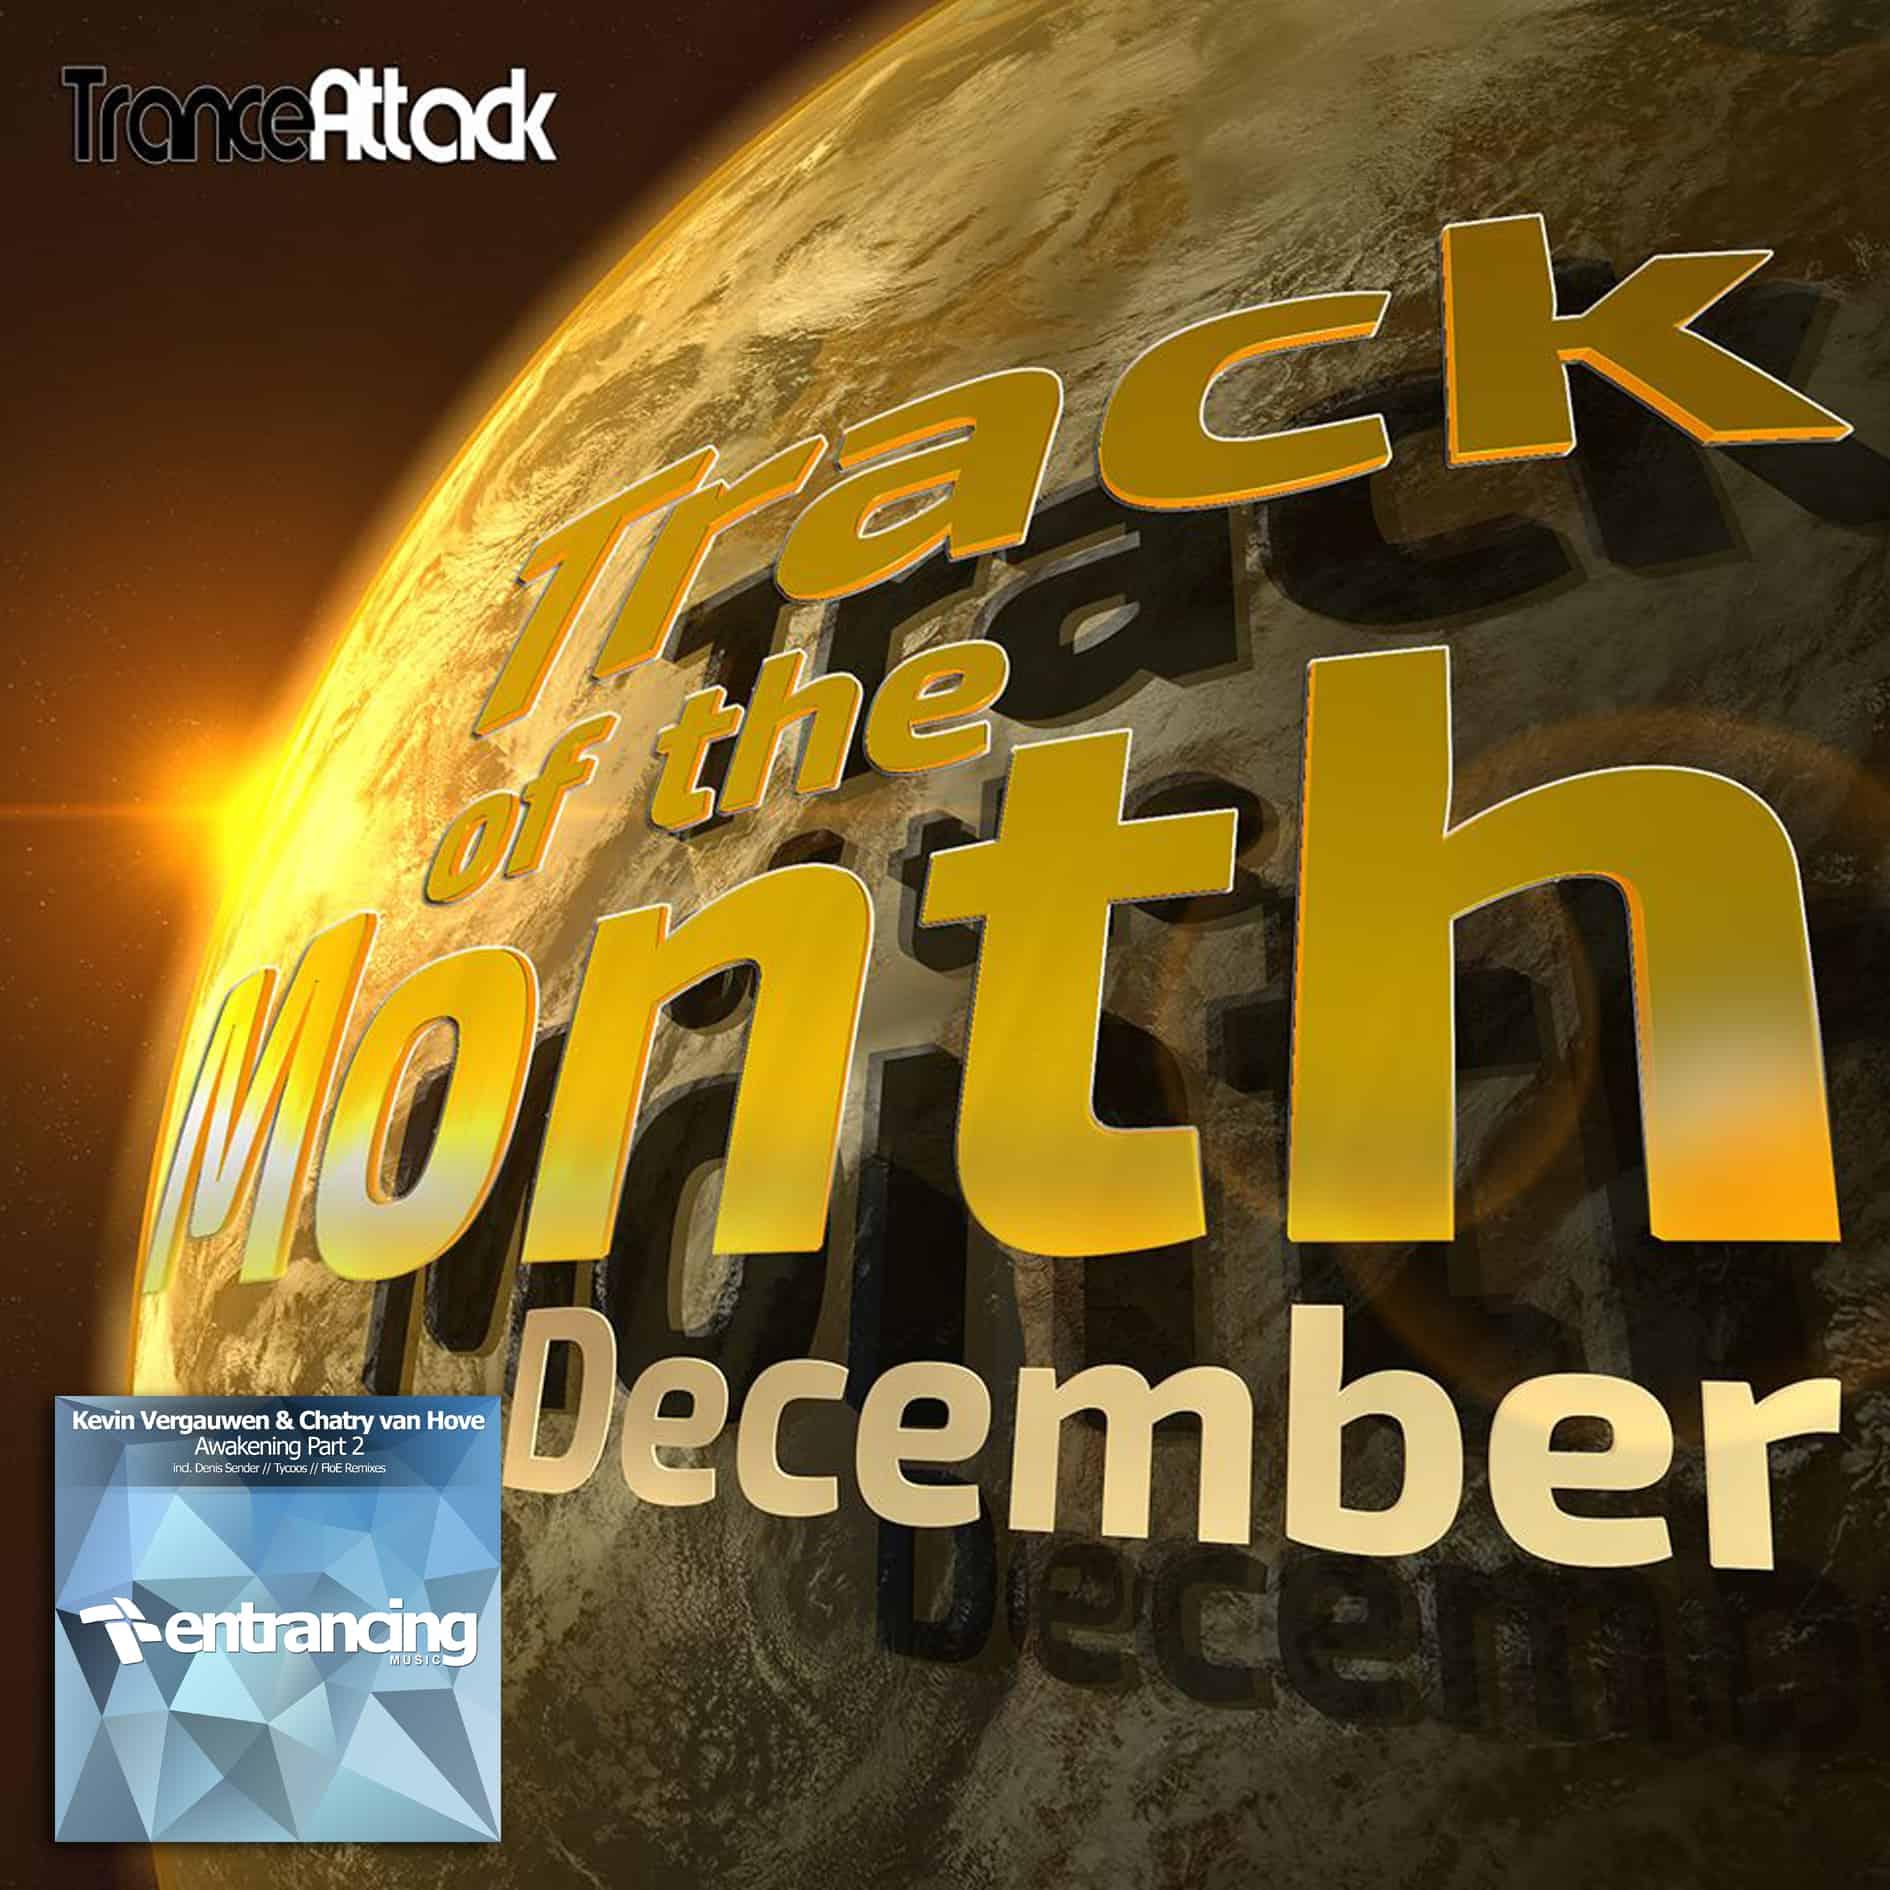 Track Of The Month December 2017: Kevin Vergauwen & Chatry Van Hove - Awakening (Denis Sender Remix)